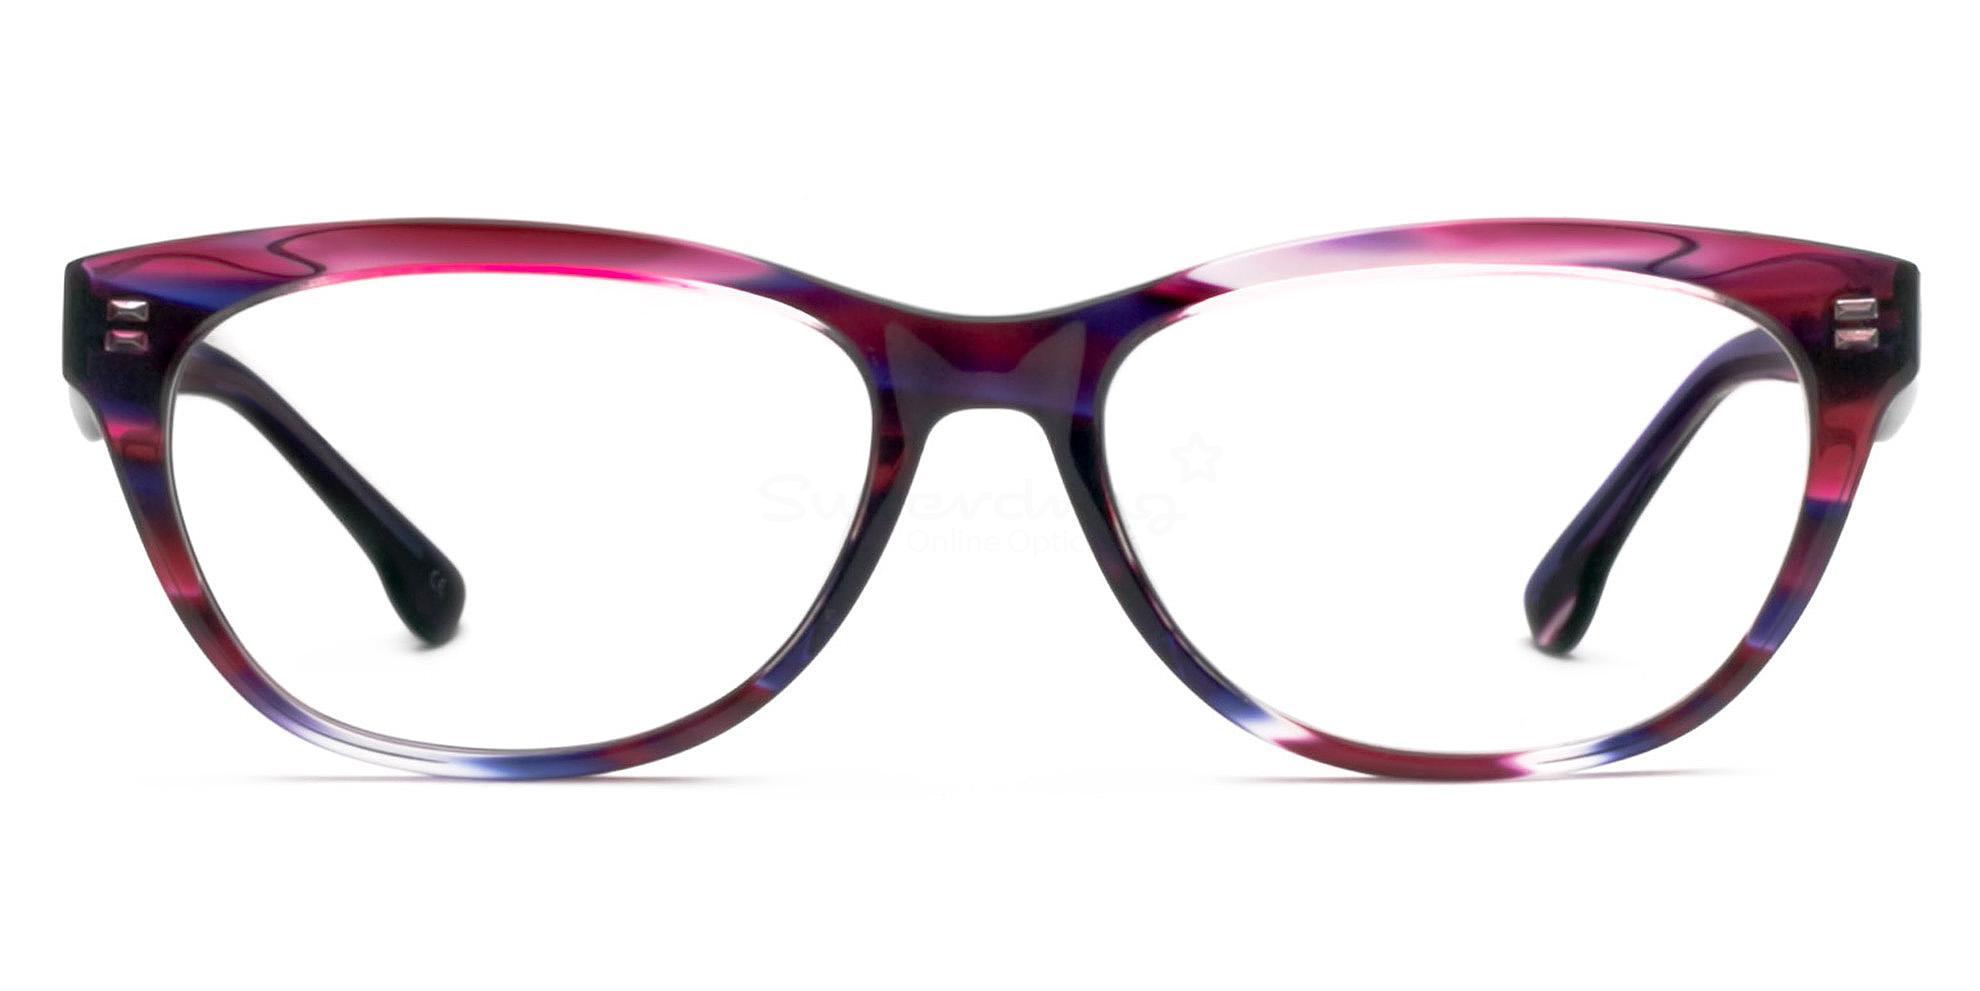 C2 HY81096 Glasses, Immense